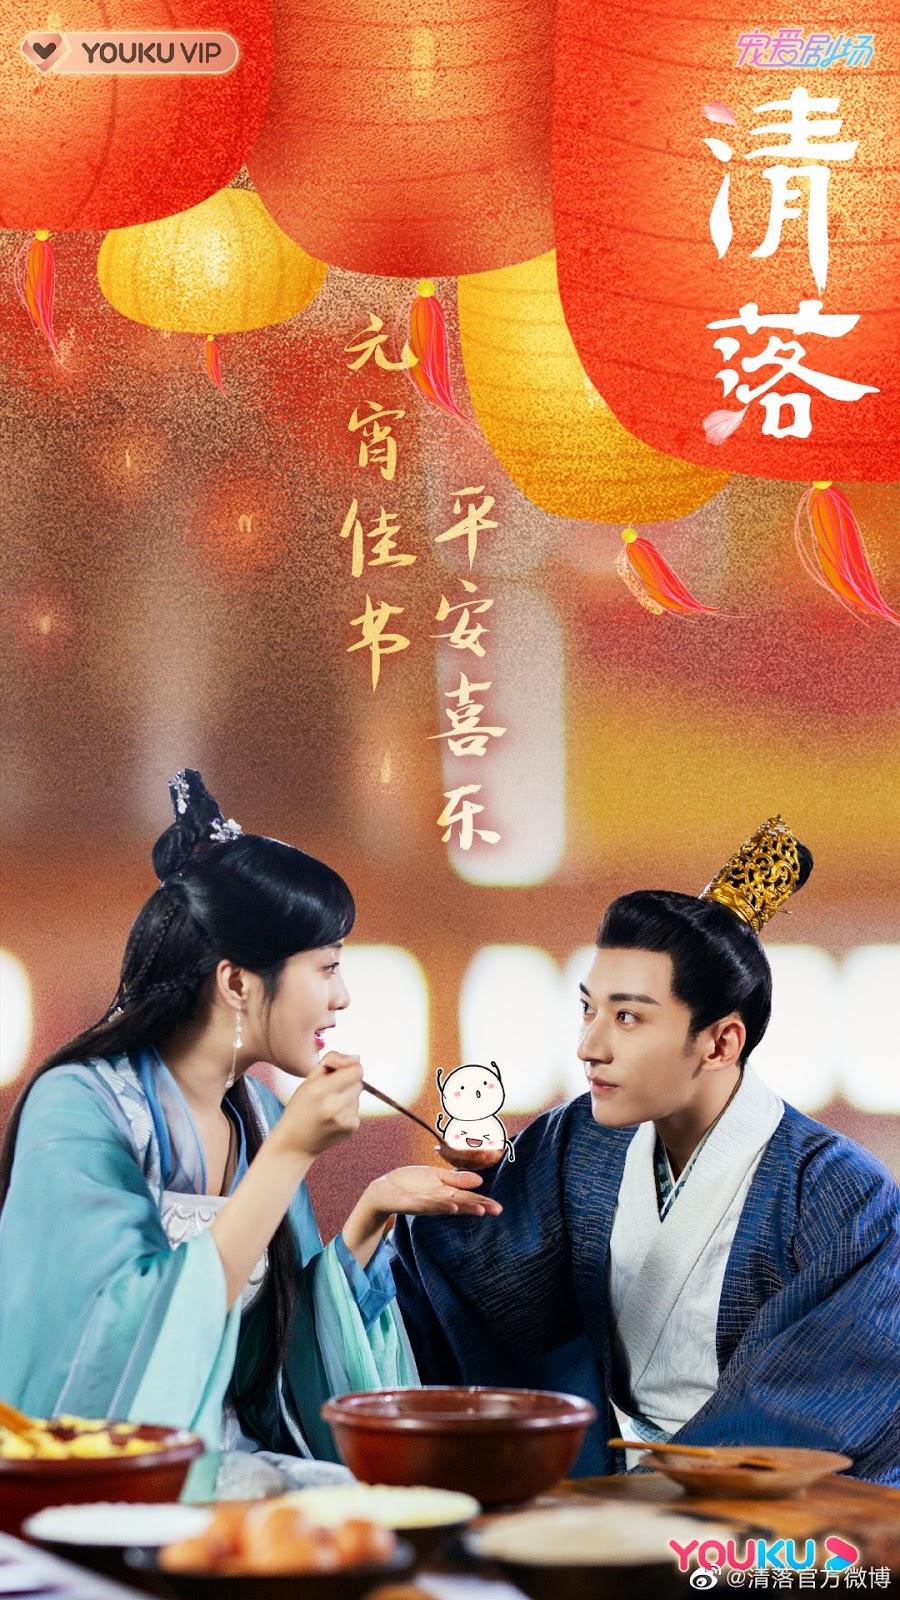 festival faroles en china audiovisuales